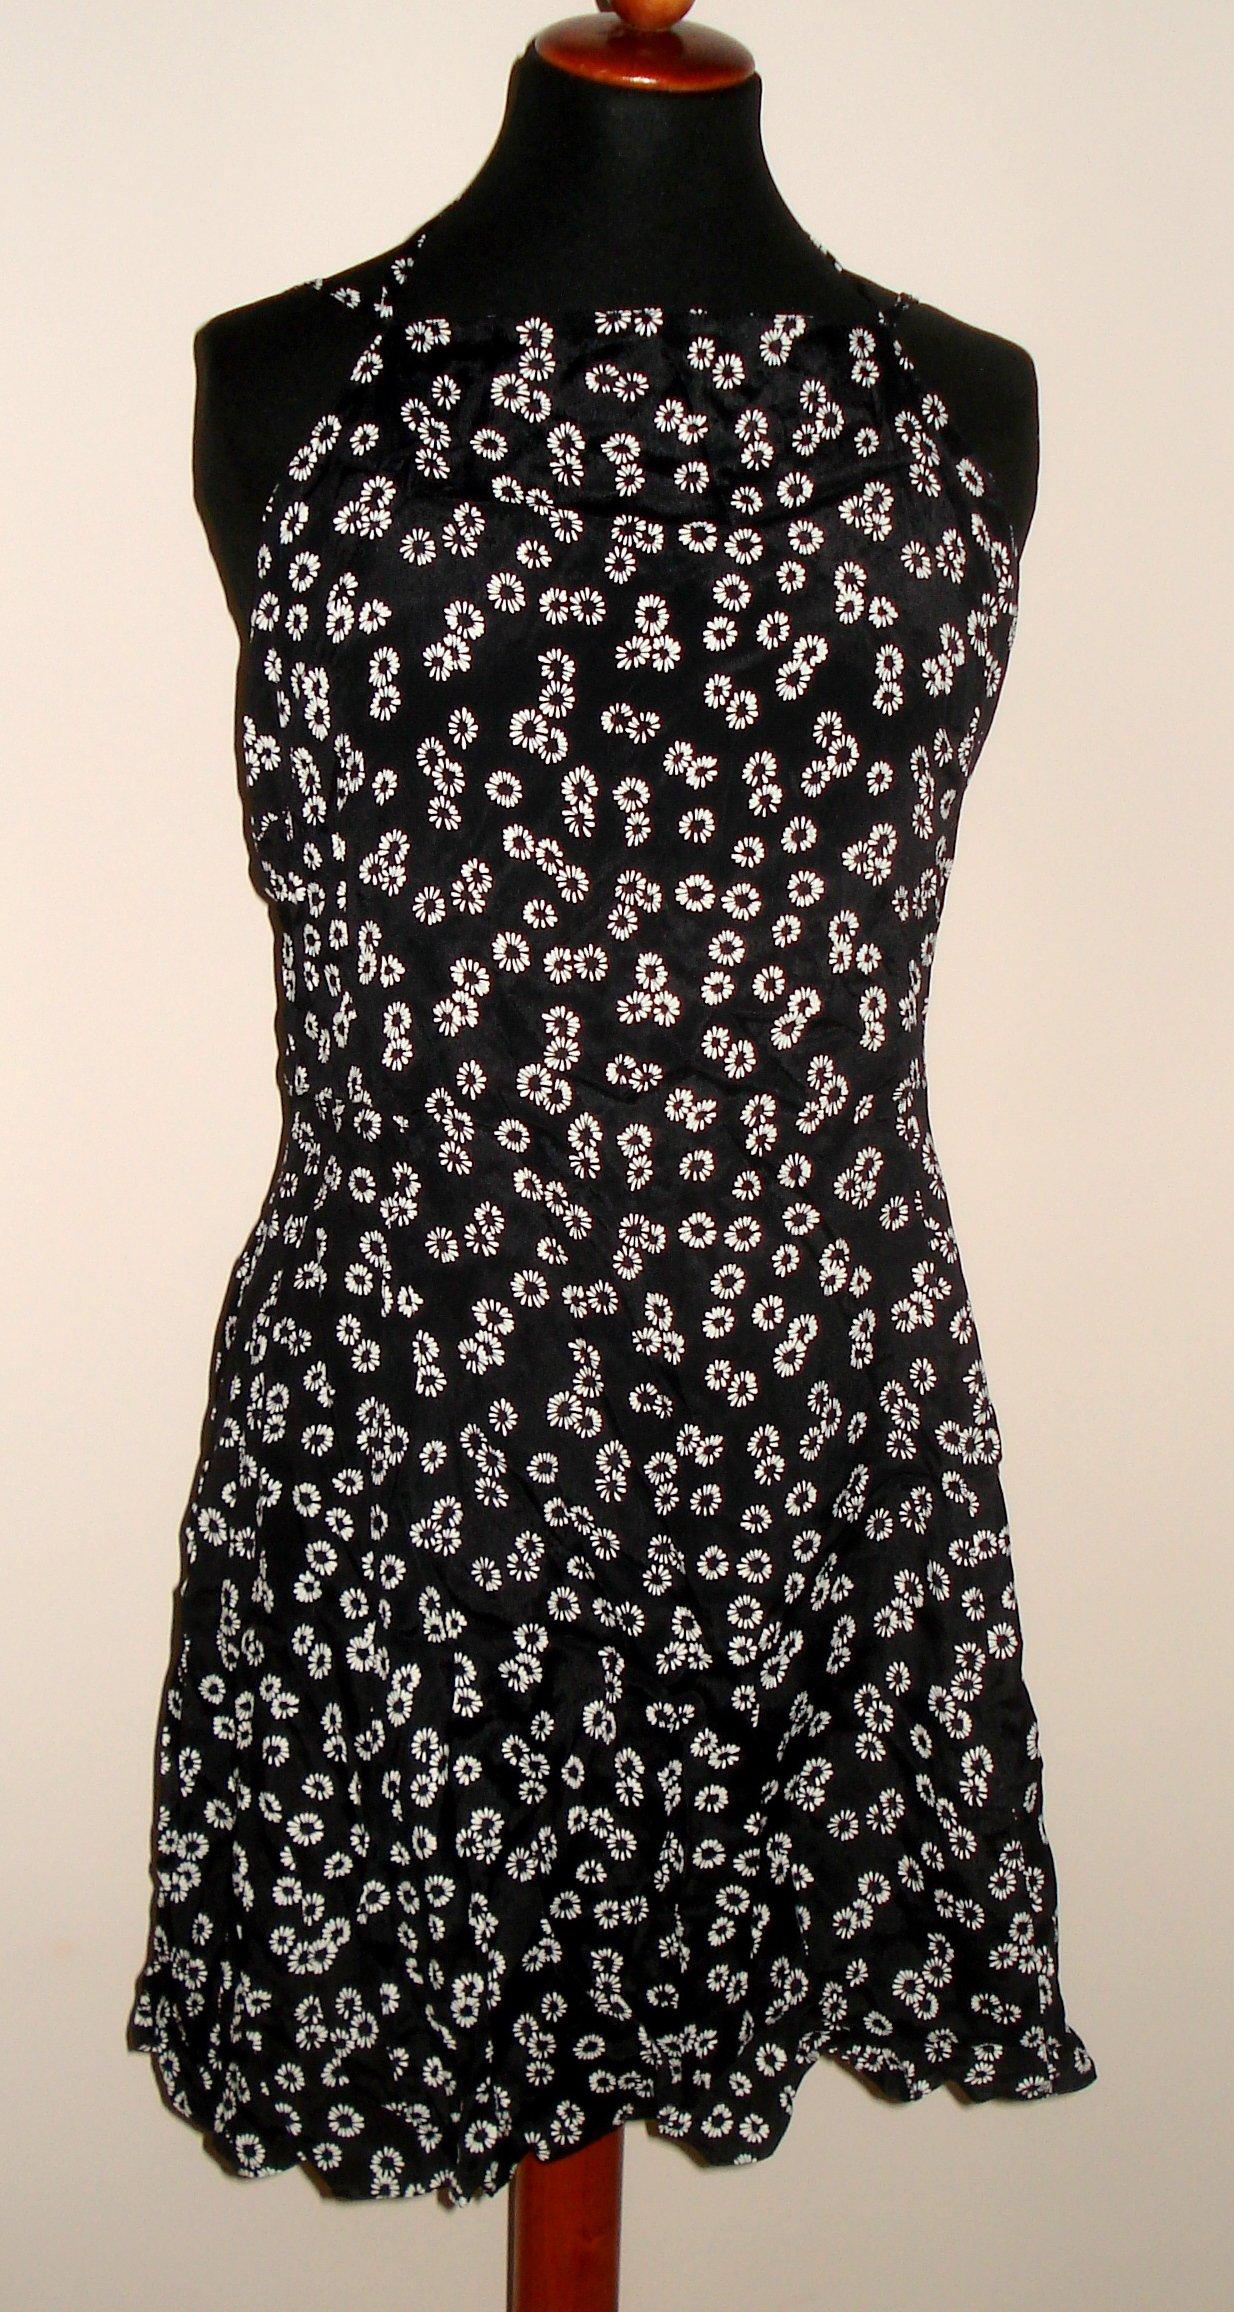 Asos czarna sukienka w stokrotki 42